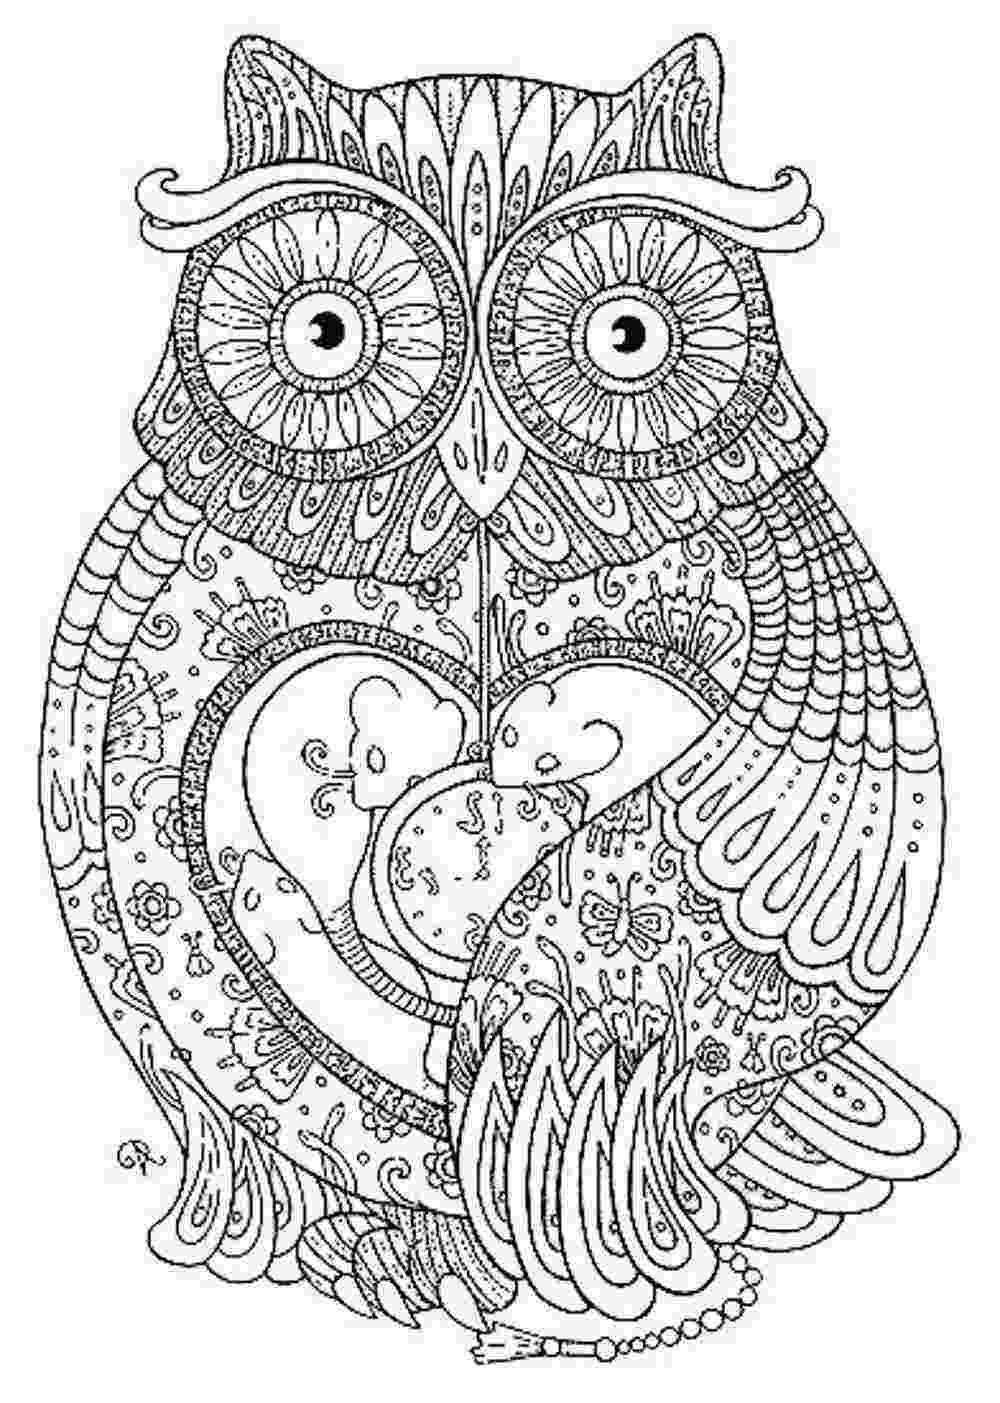 coloring pages for adults mandala mandala to download in pdf 1 malas adult coloring pages for pages adults mandala coloring